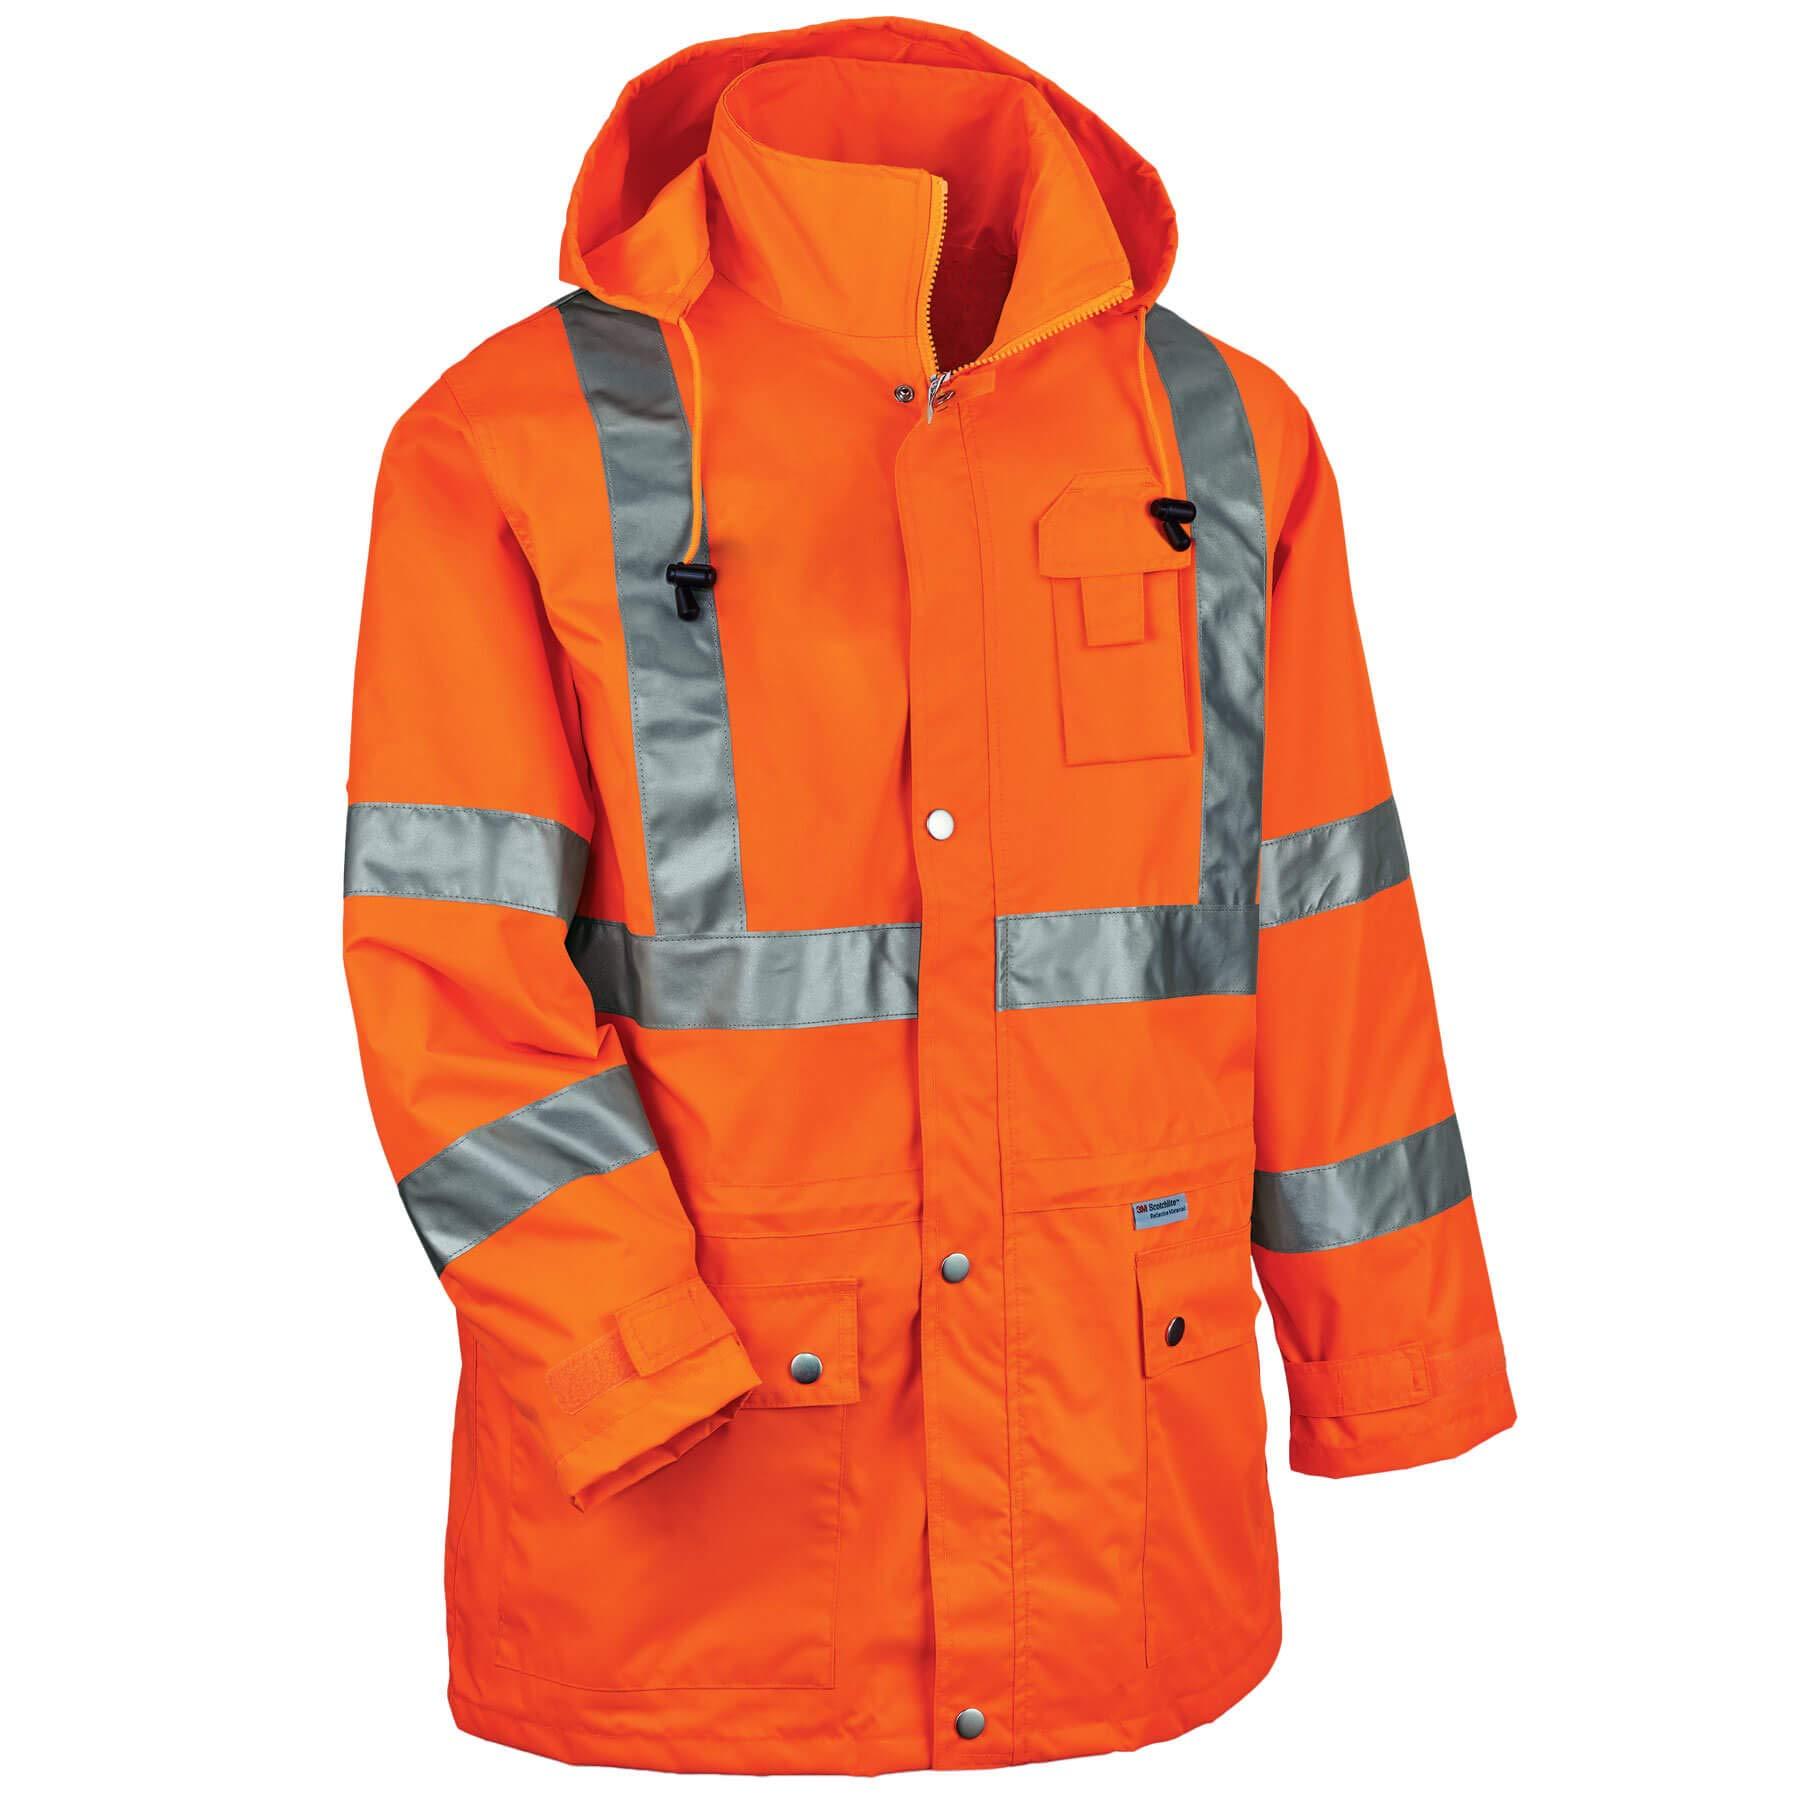 Ergodyne GloWear 8365 Rain Jacket, High Visibility, Reflective, ANSI Compliant